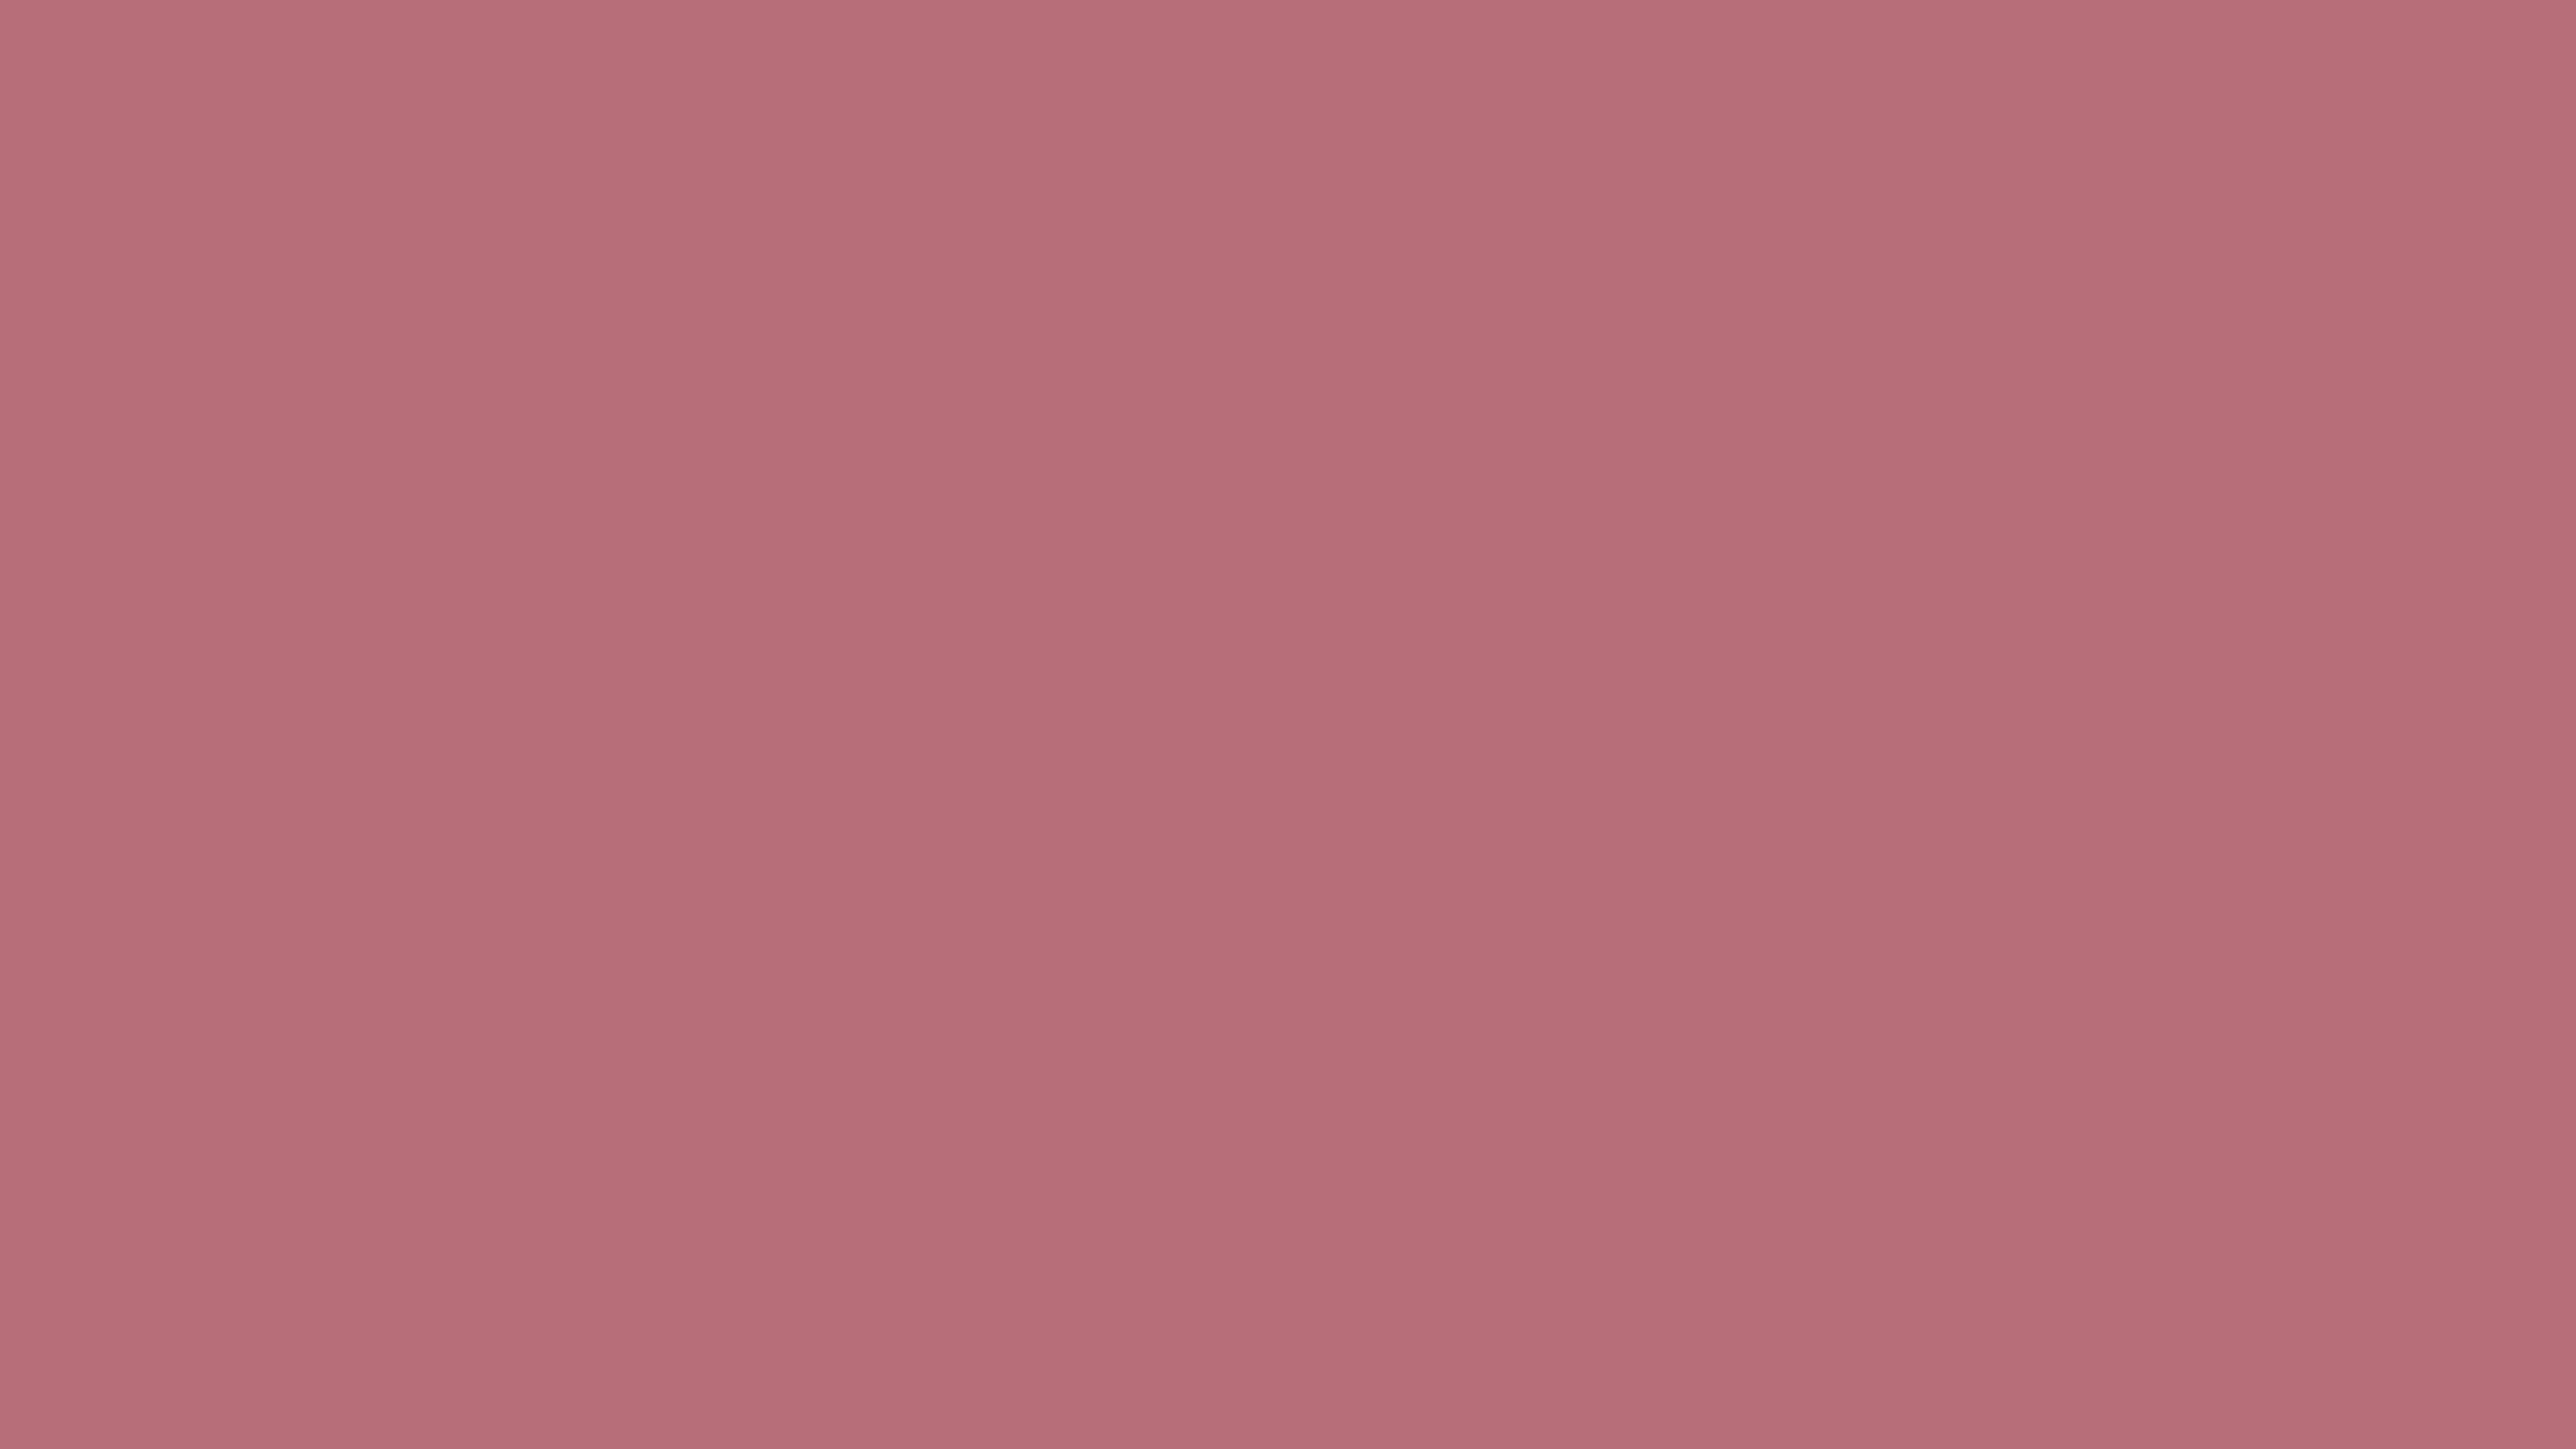 7680x4320 Rose Gold Solid Color Background